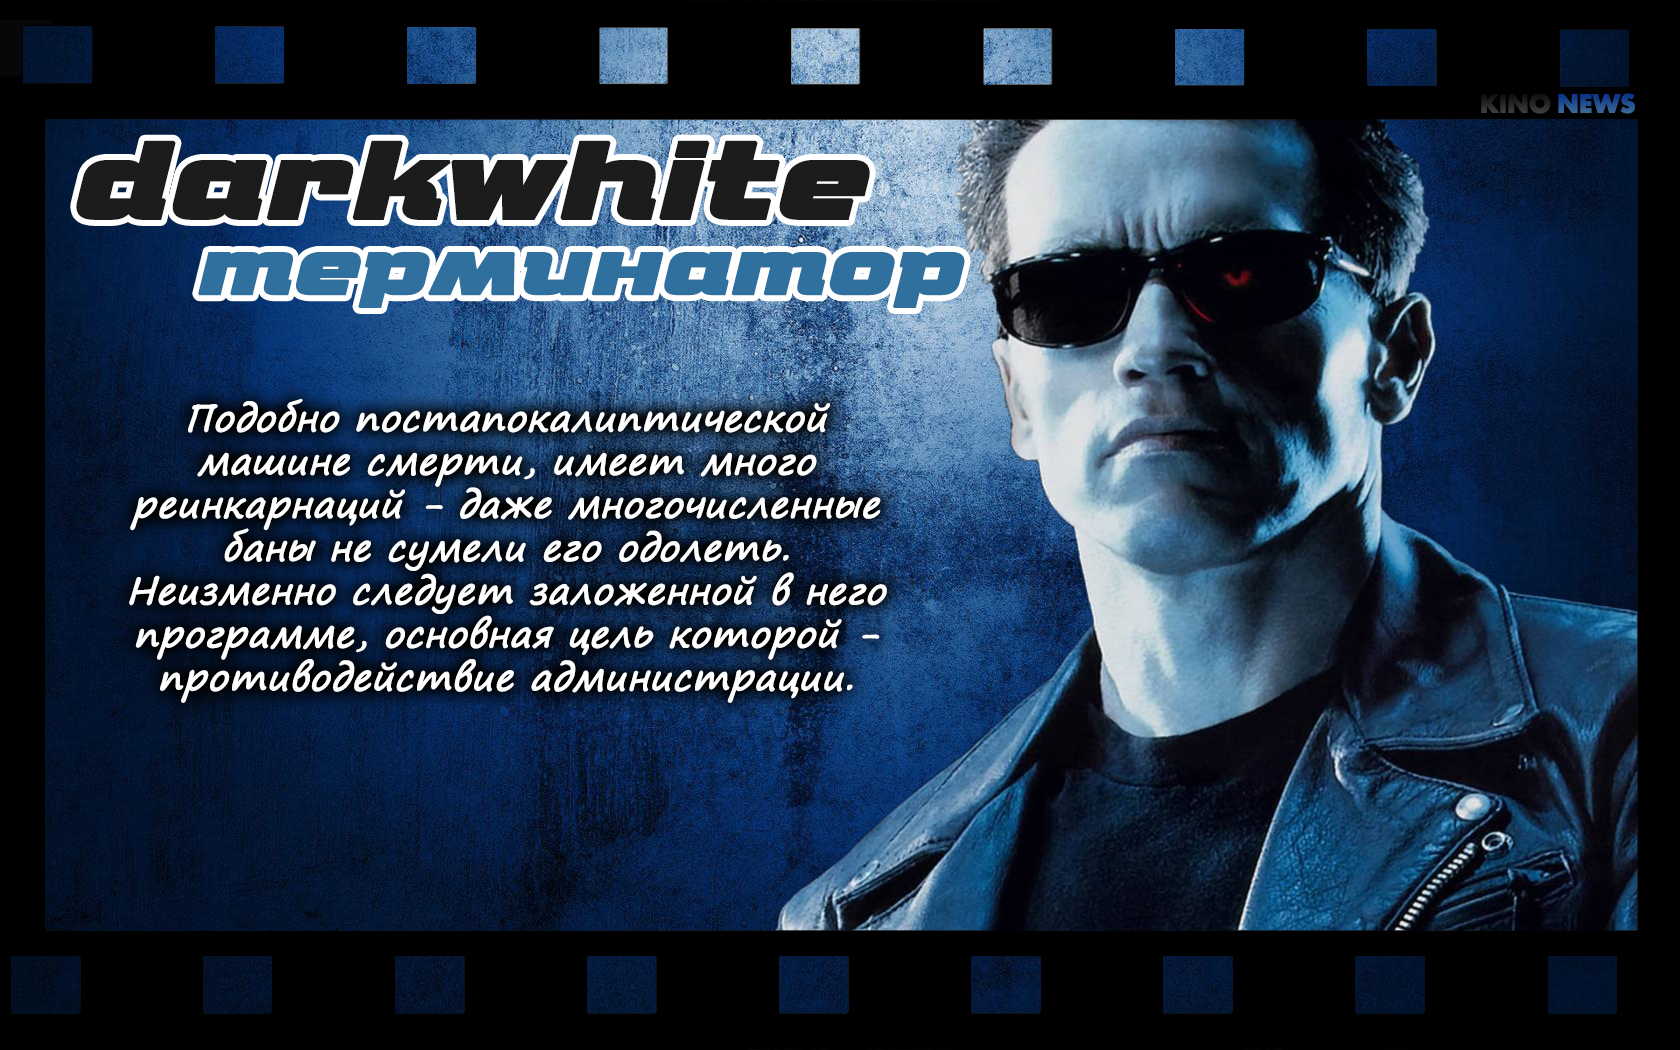 https://www.kinonews.ru/insimgs/2017/persimg/persimg77944_34.jpg